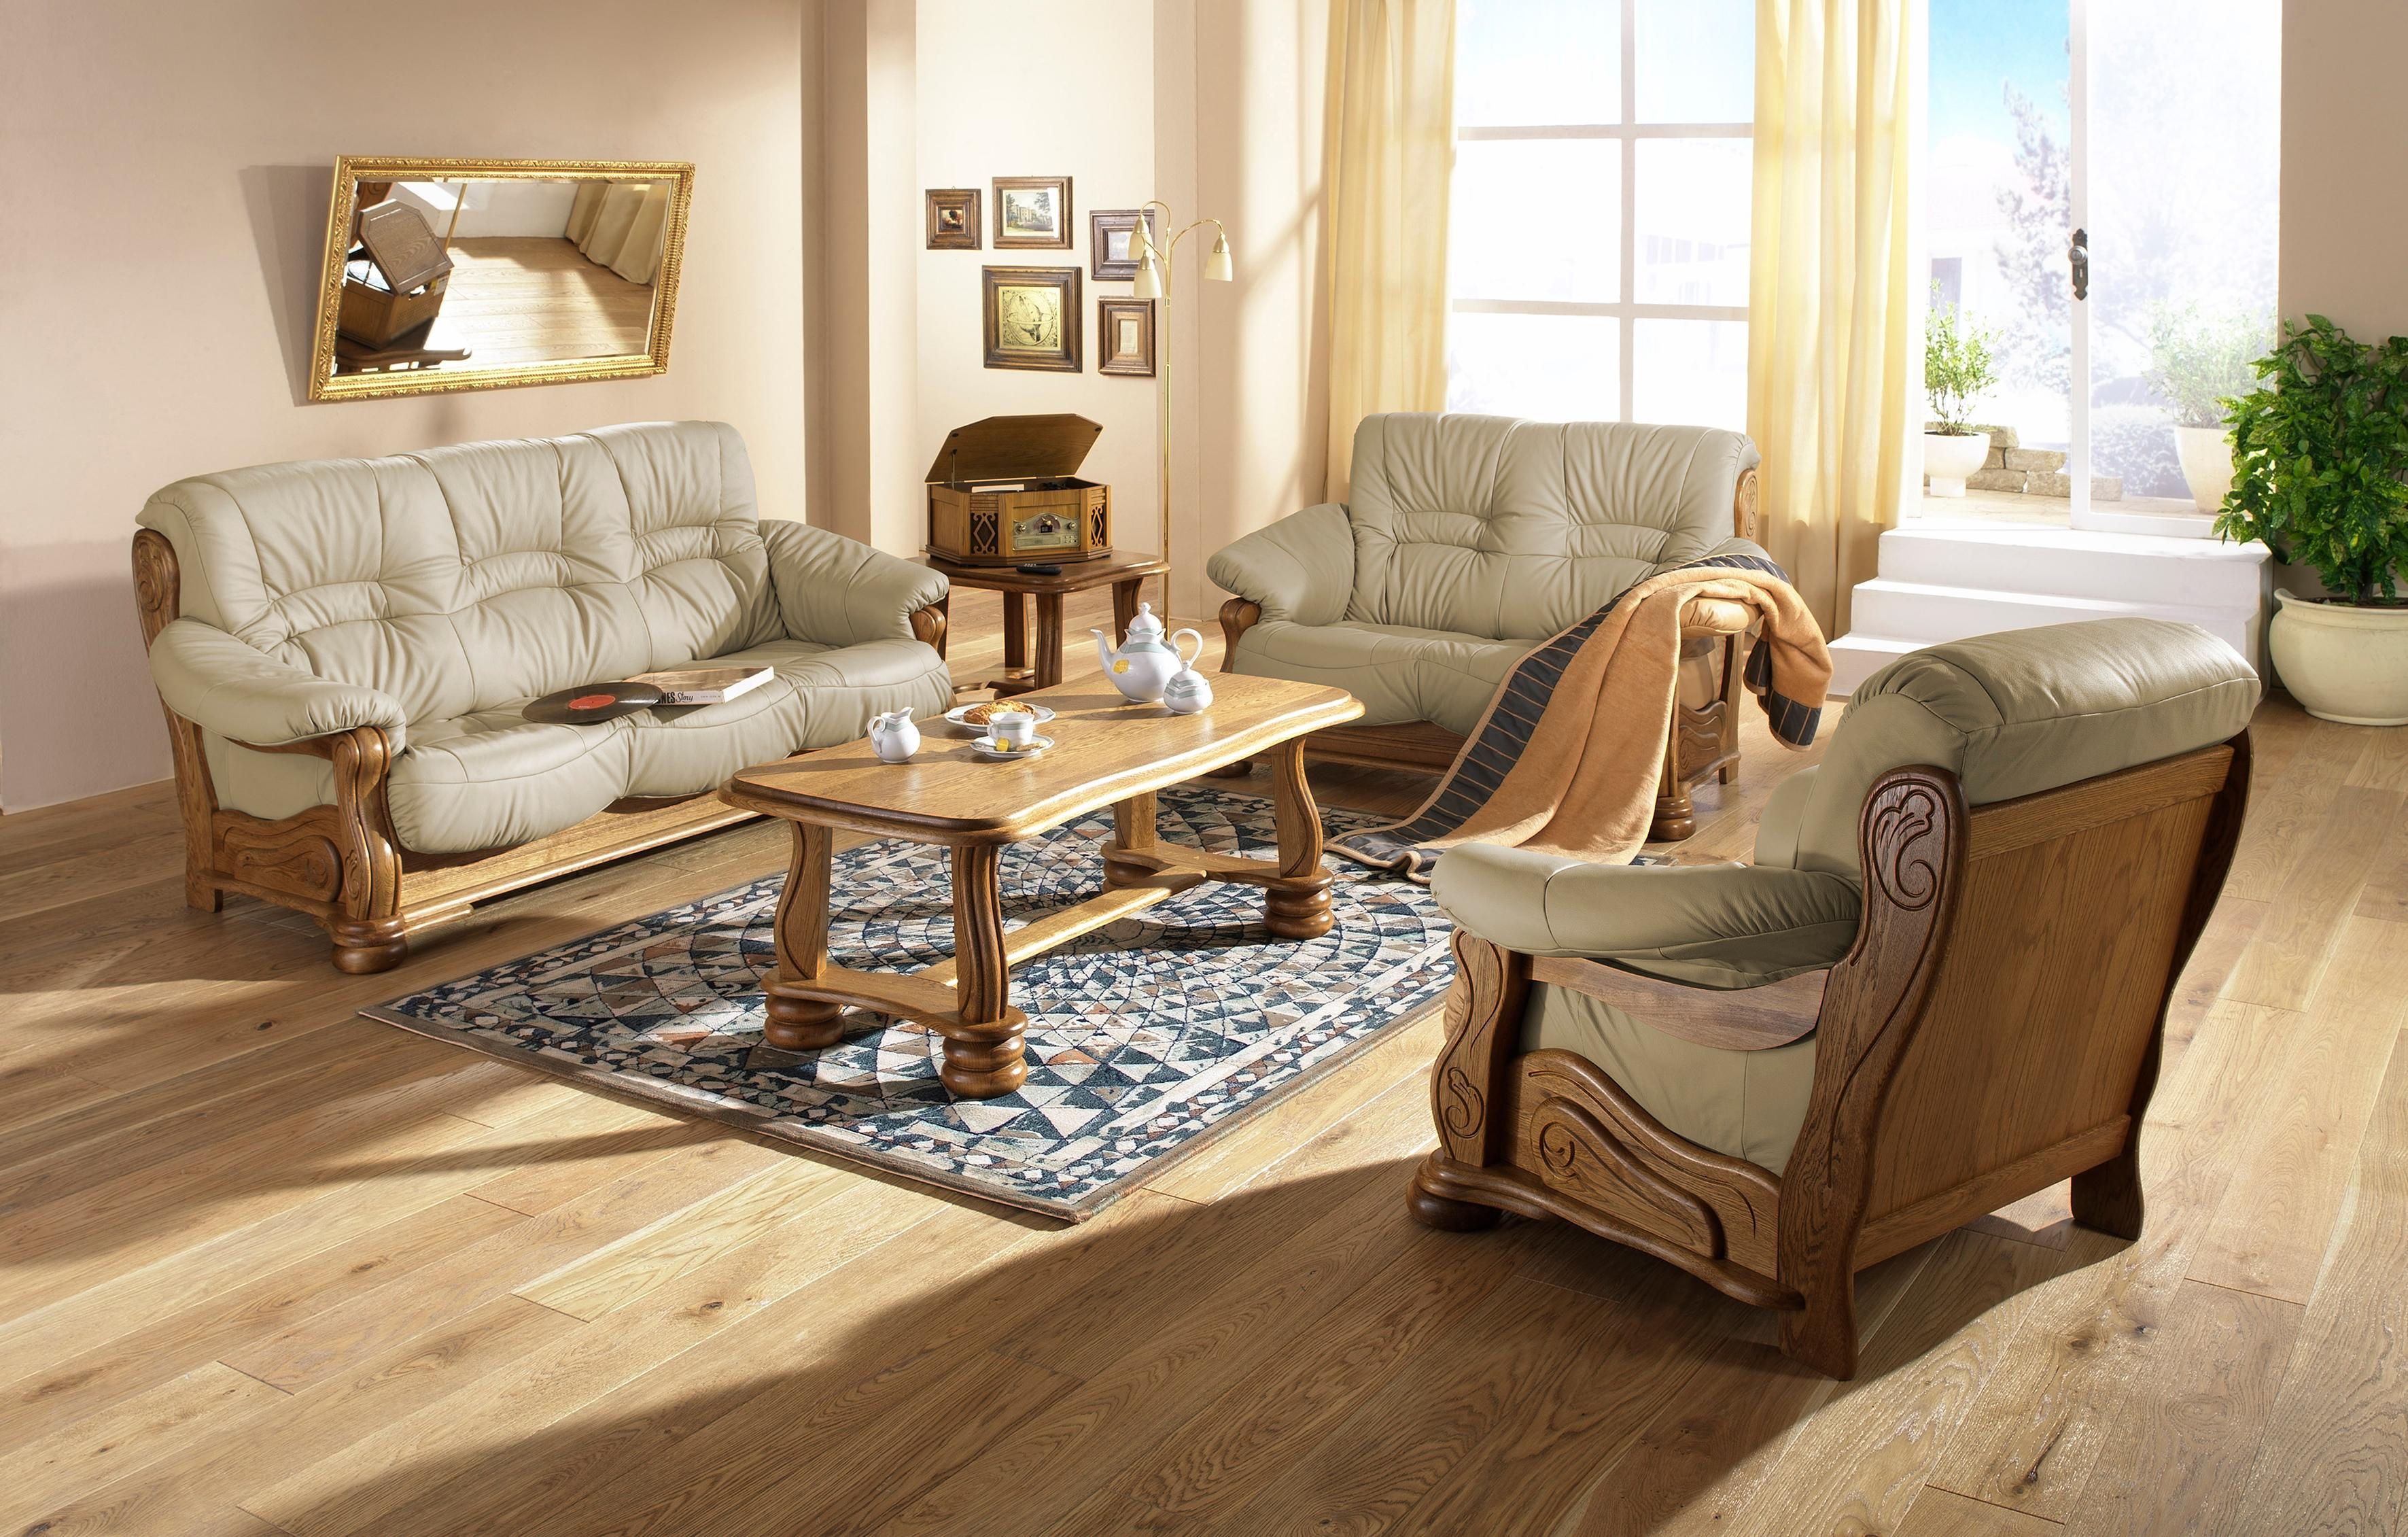 Max Winzer 2 Sitzer Sofa Texas mit dekorativem